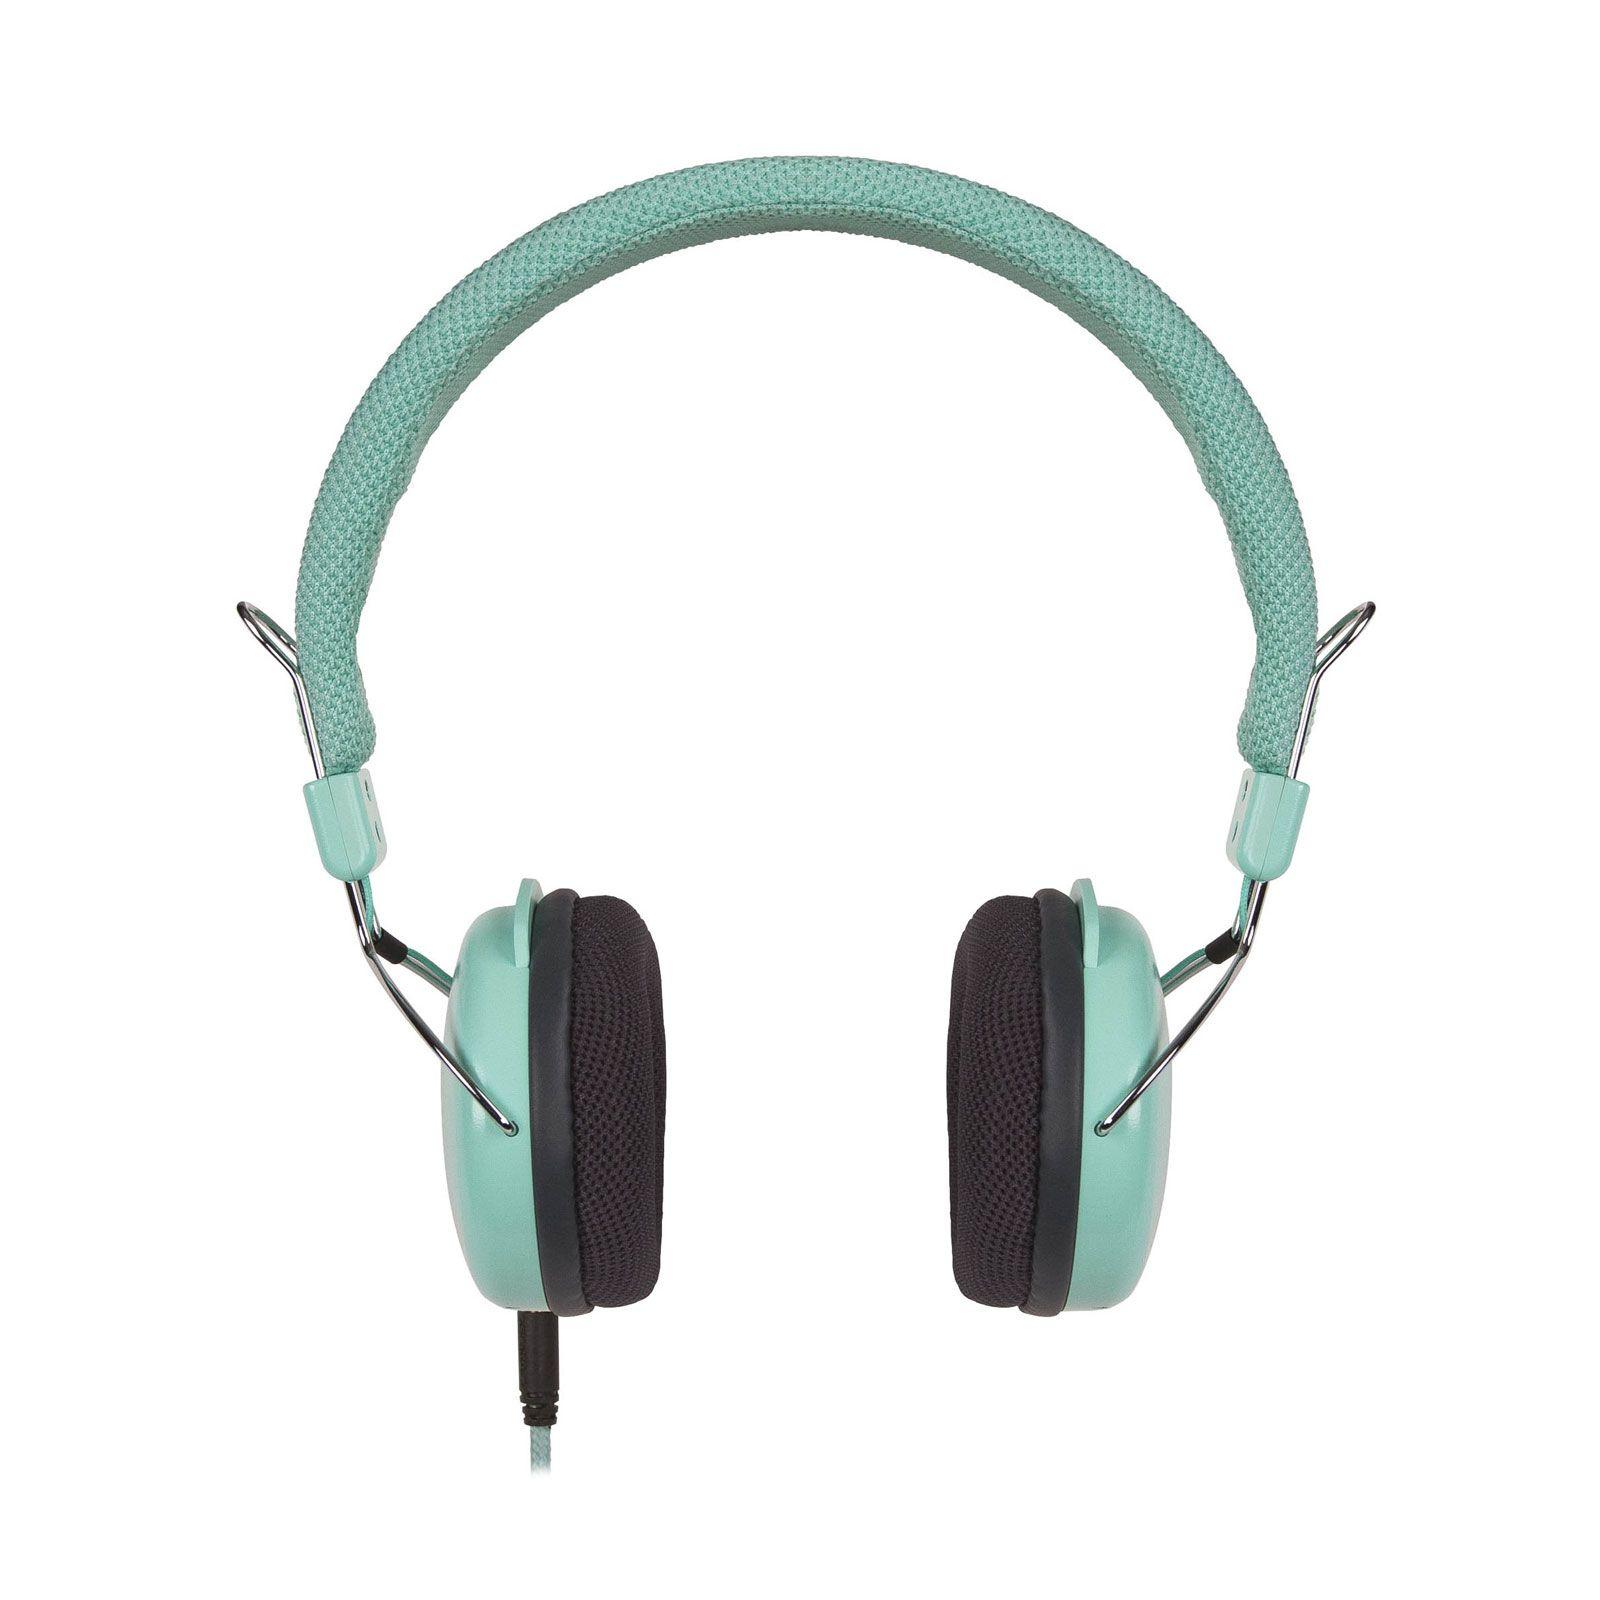 Turntable Adjustable Headphones in Turquoise | dotandbo.com